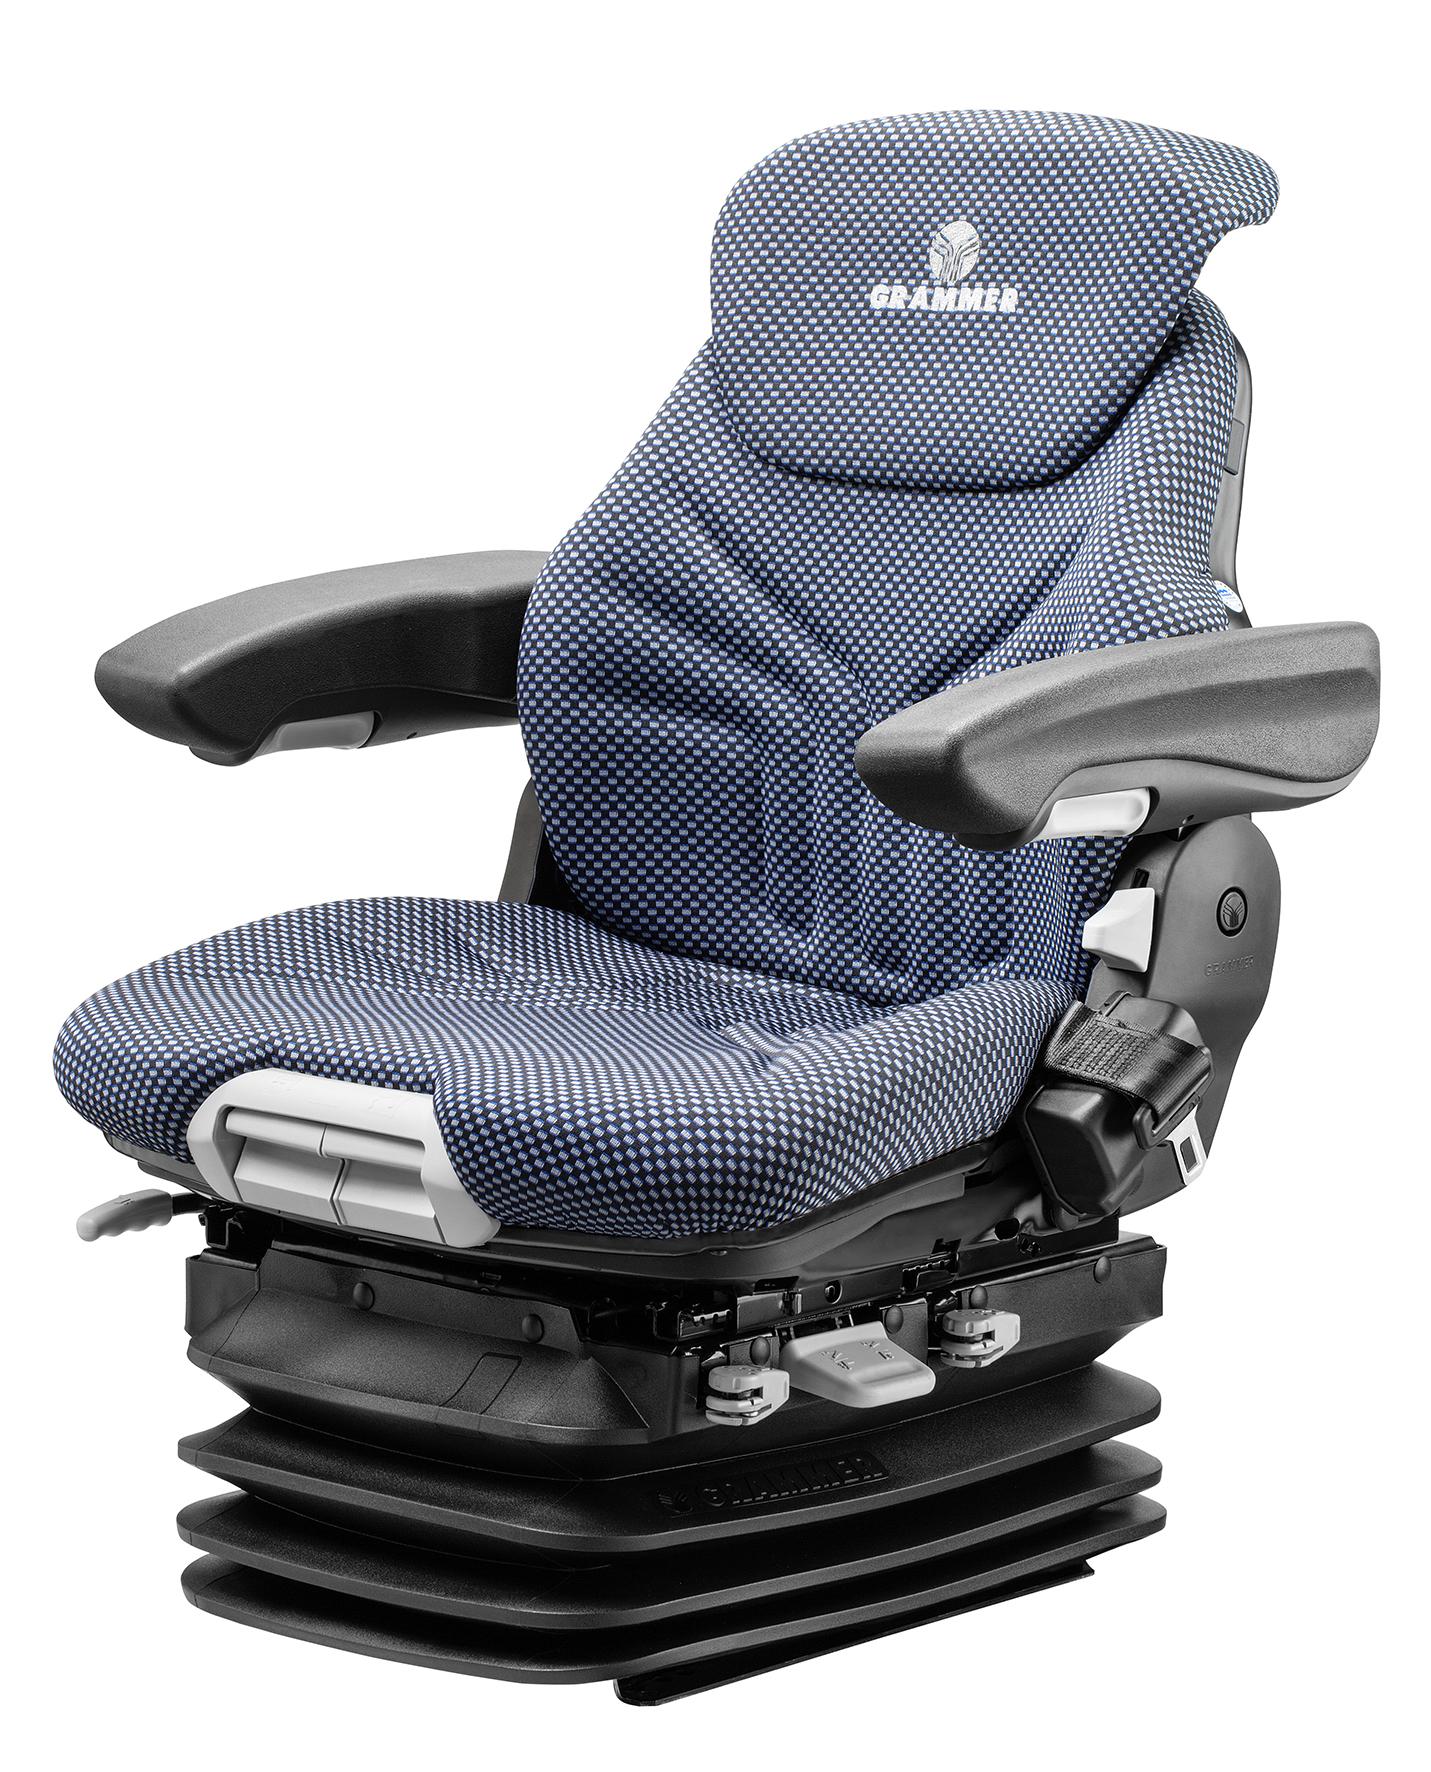 Fahrersitze Stapler